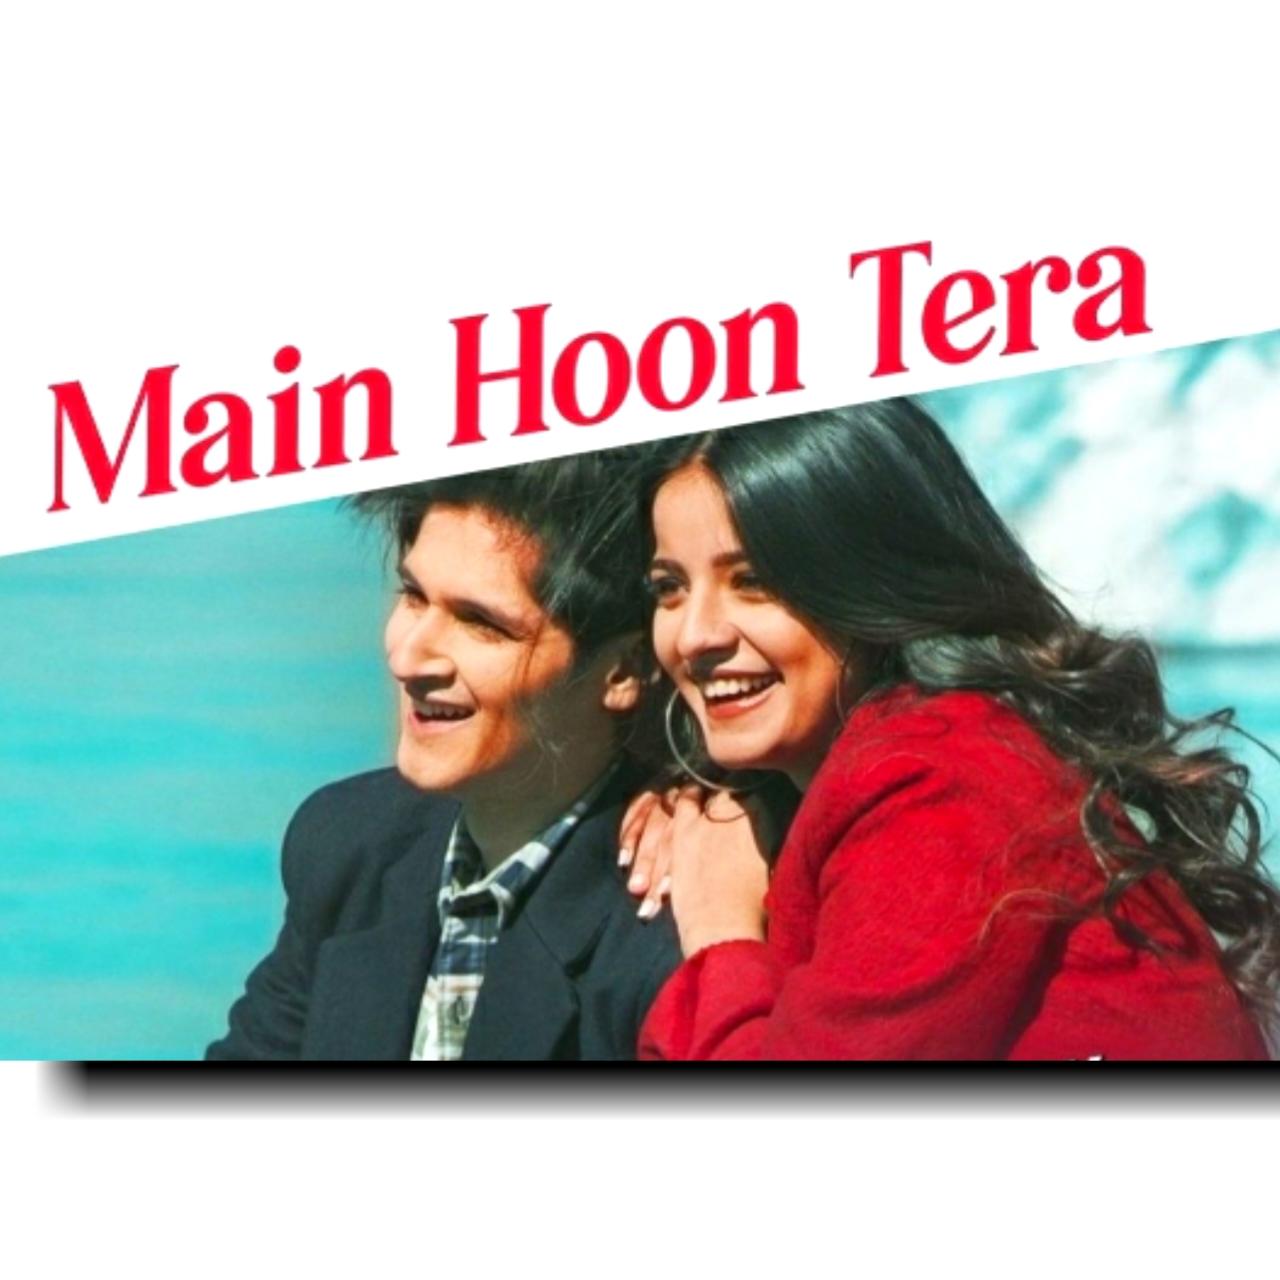 Latest hindi beautiful track Main Hoon Tere has sung in the beautiful voice of Pranay Bahuguna.